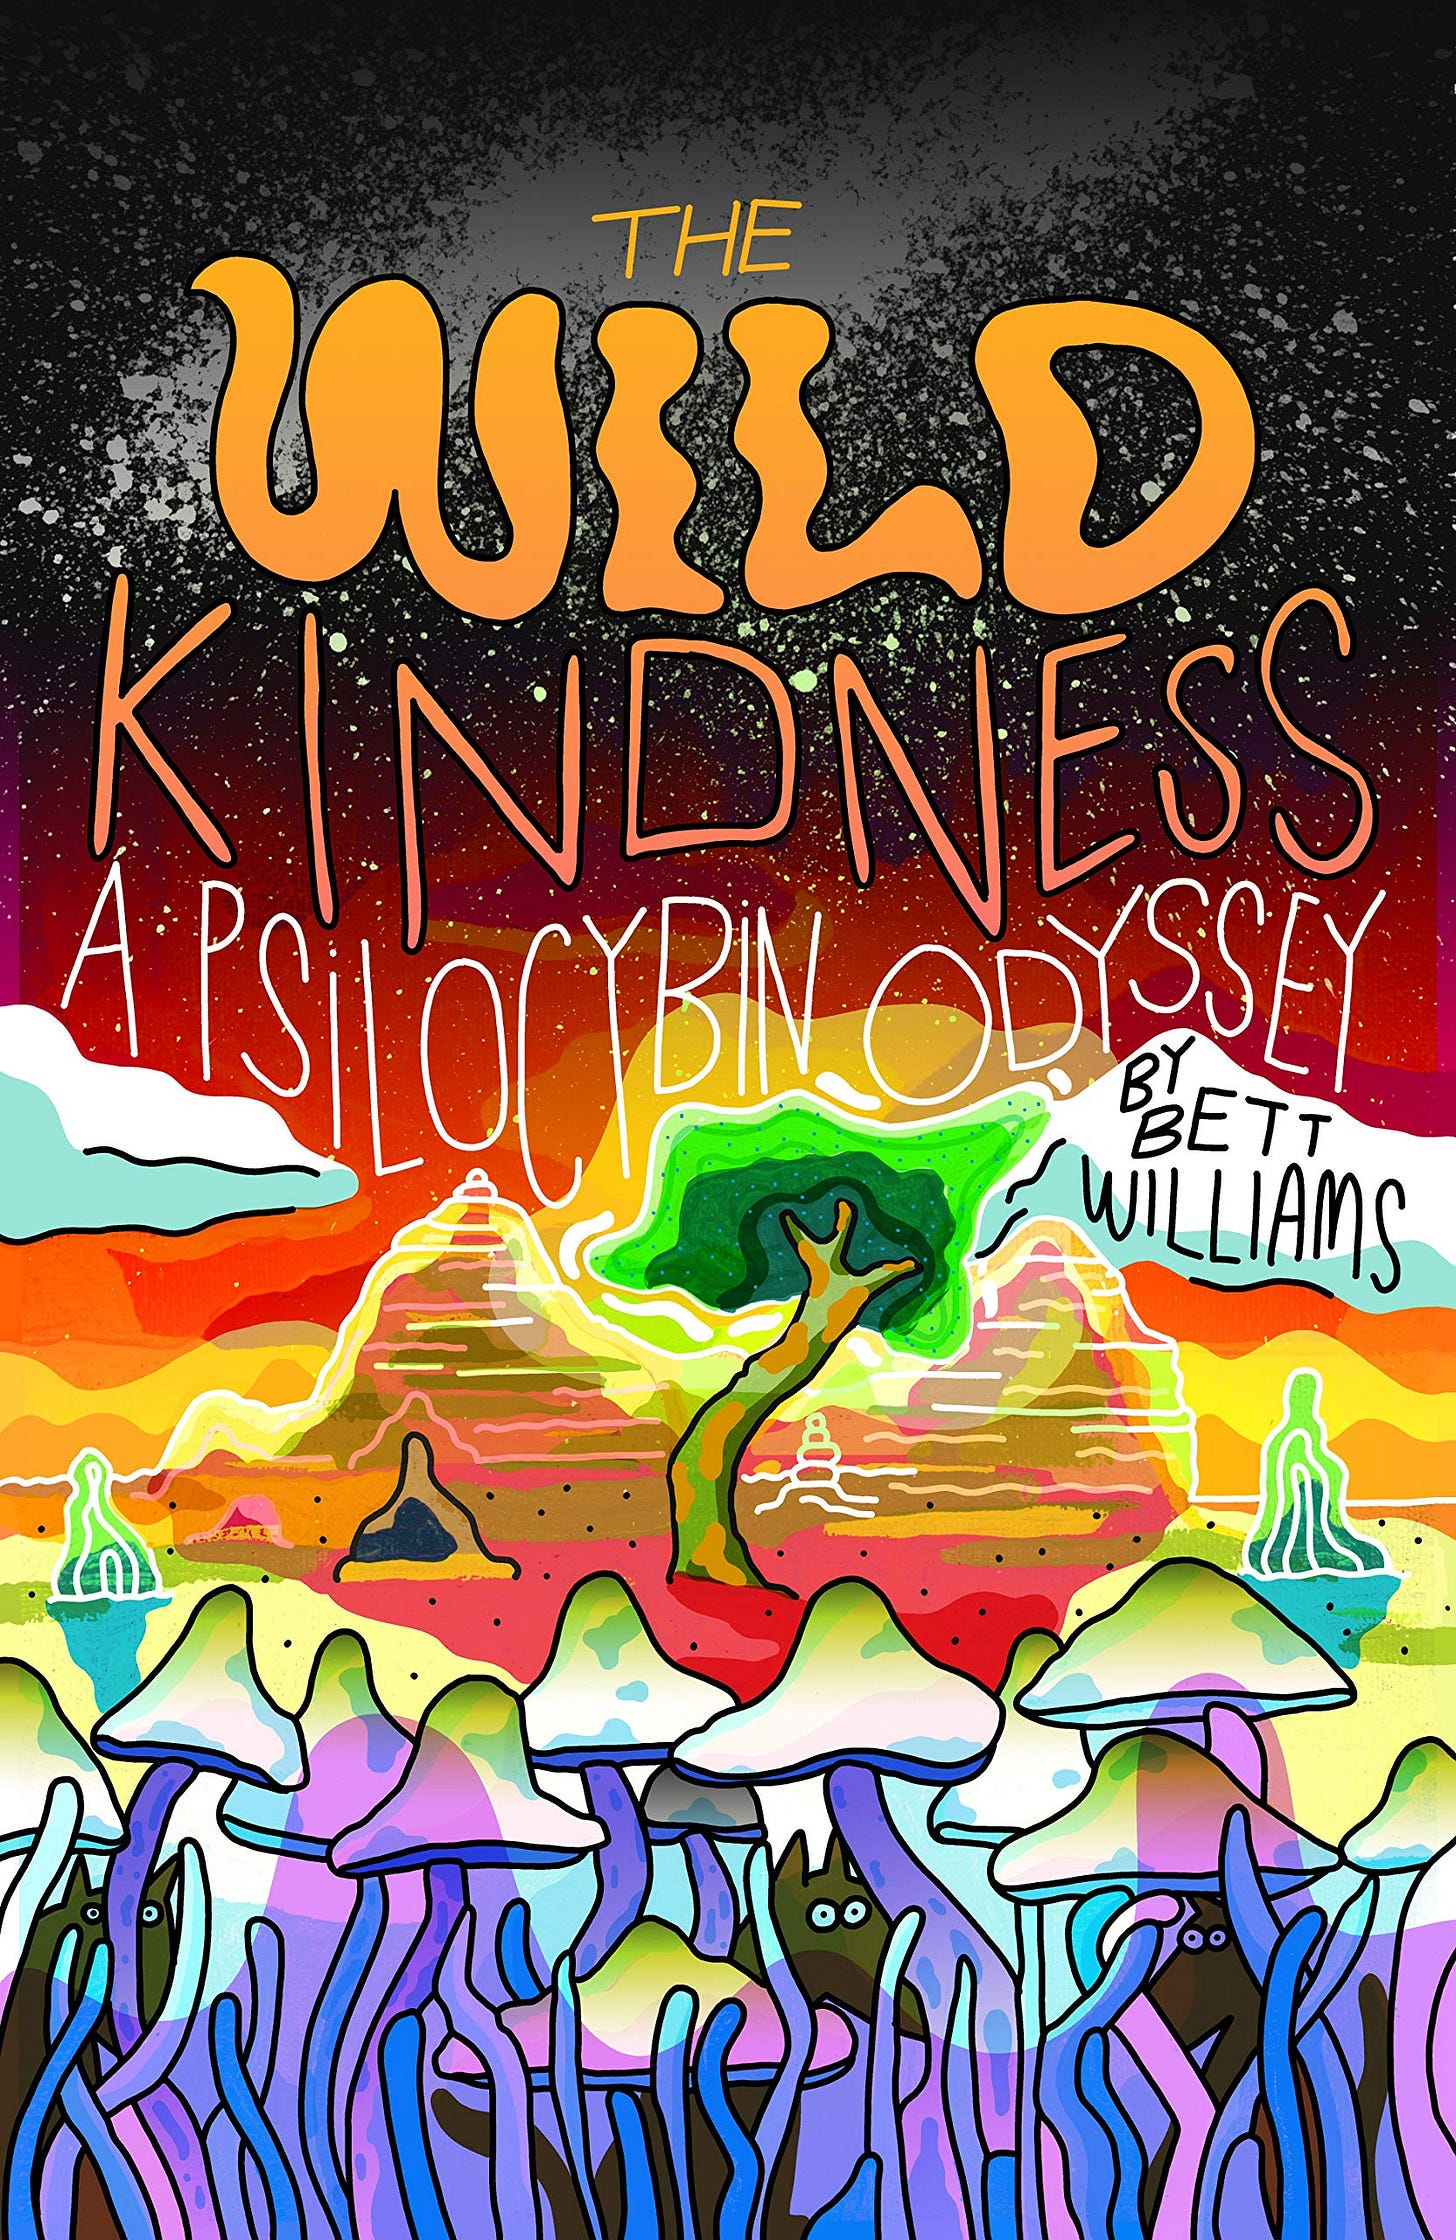 Amazon.com: The Wild Kindness: A Psilocybin Odyssey (9781948340311):  Williams, Bett: Books